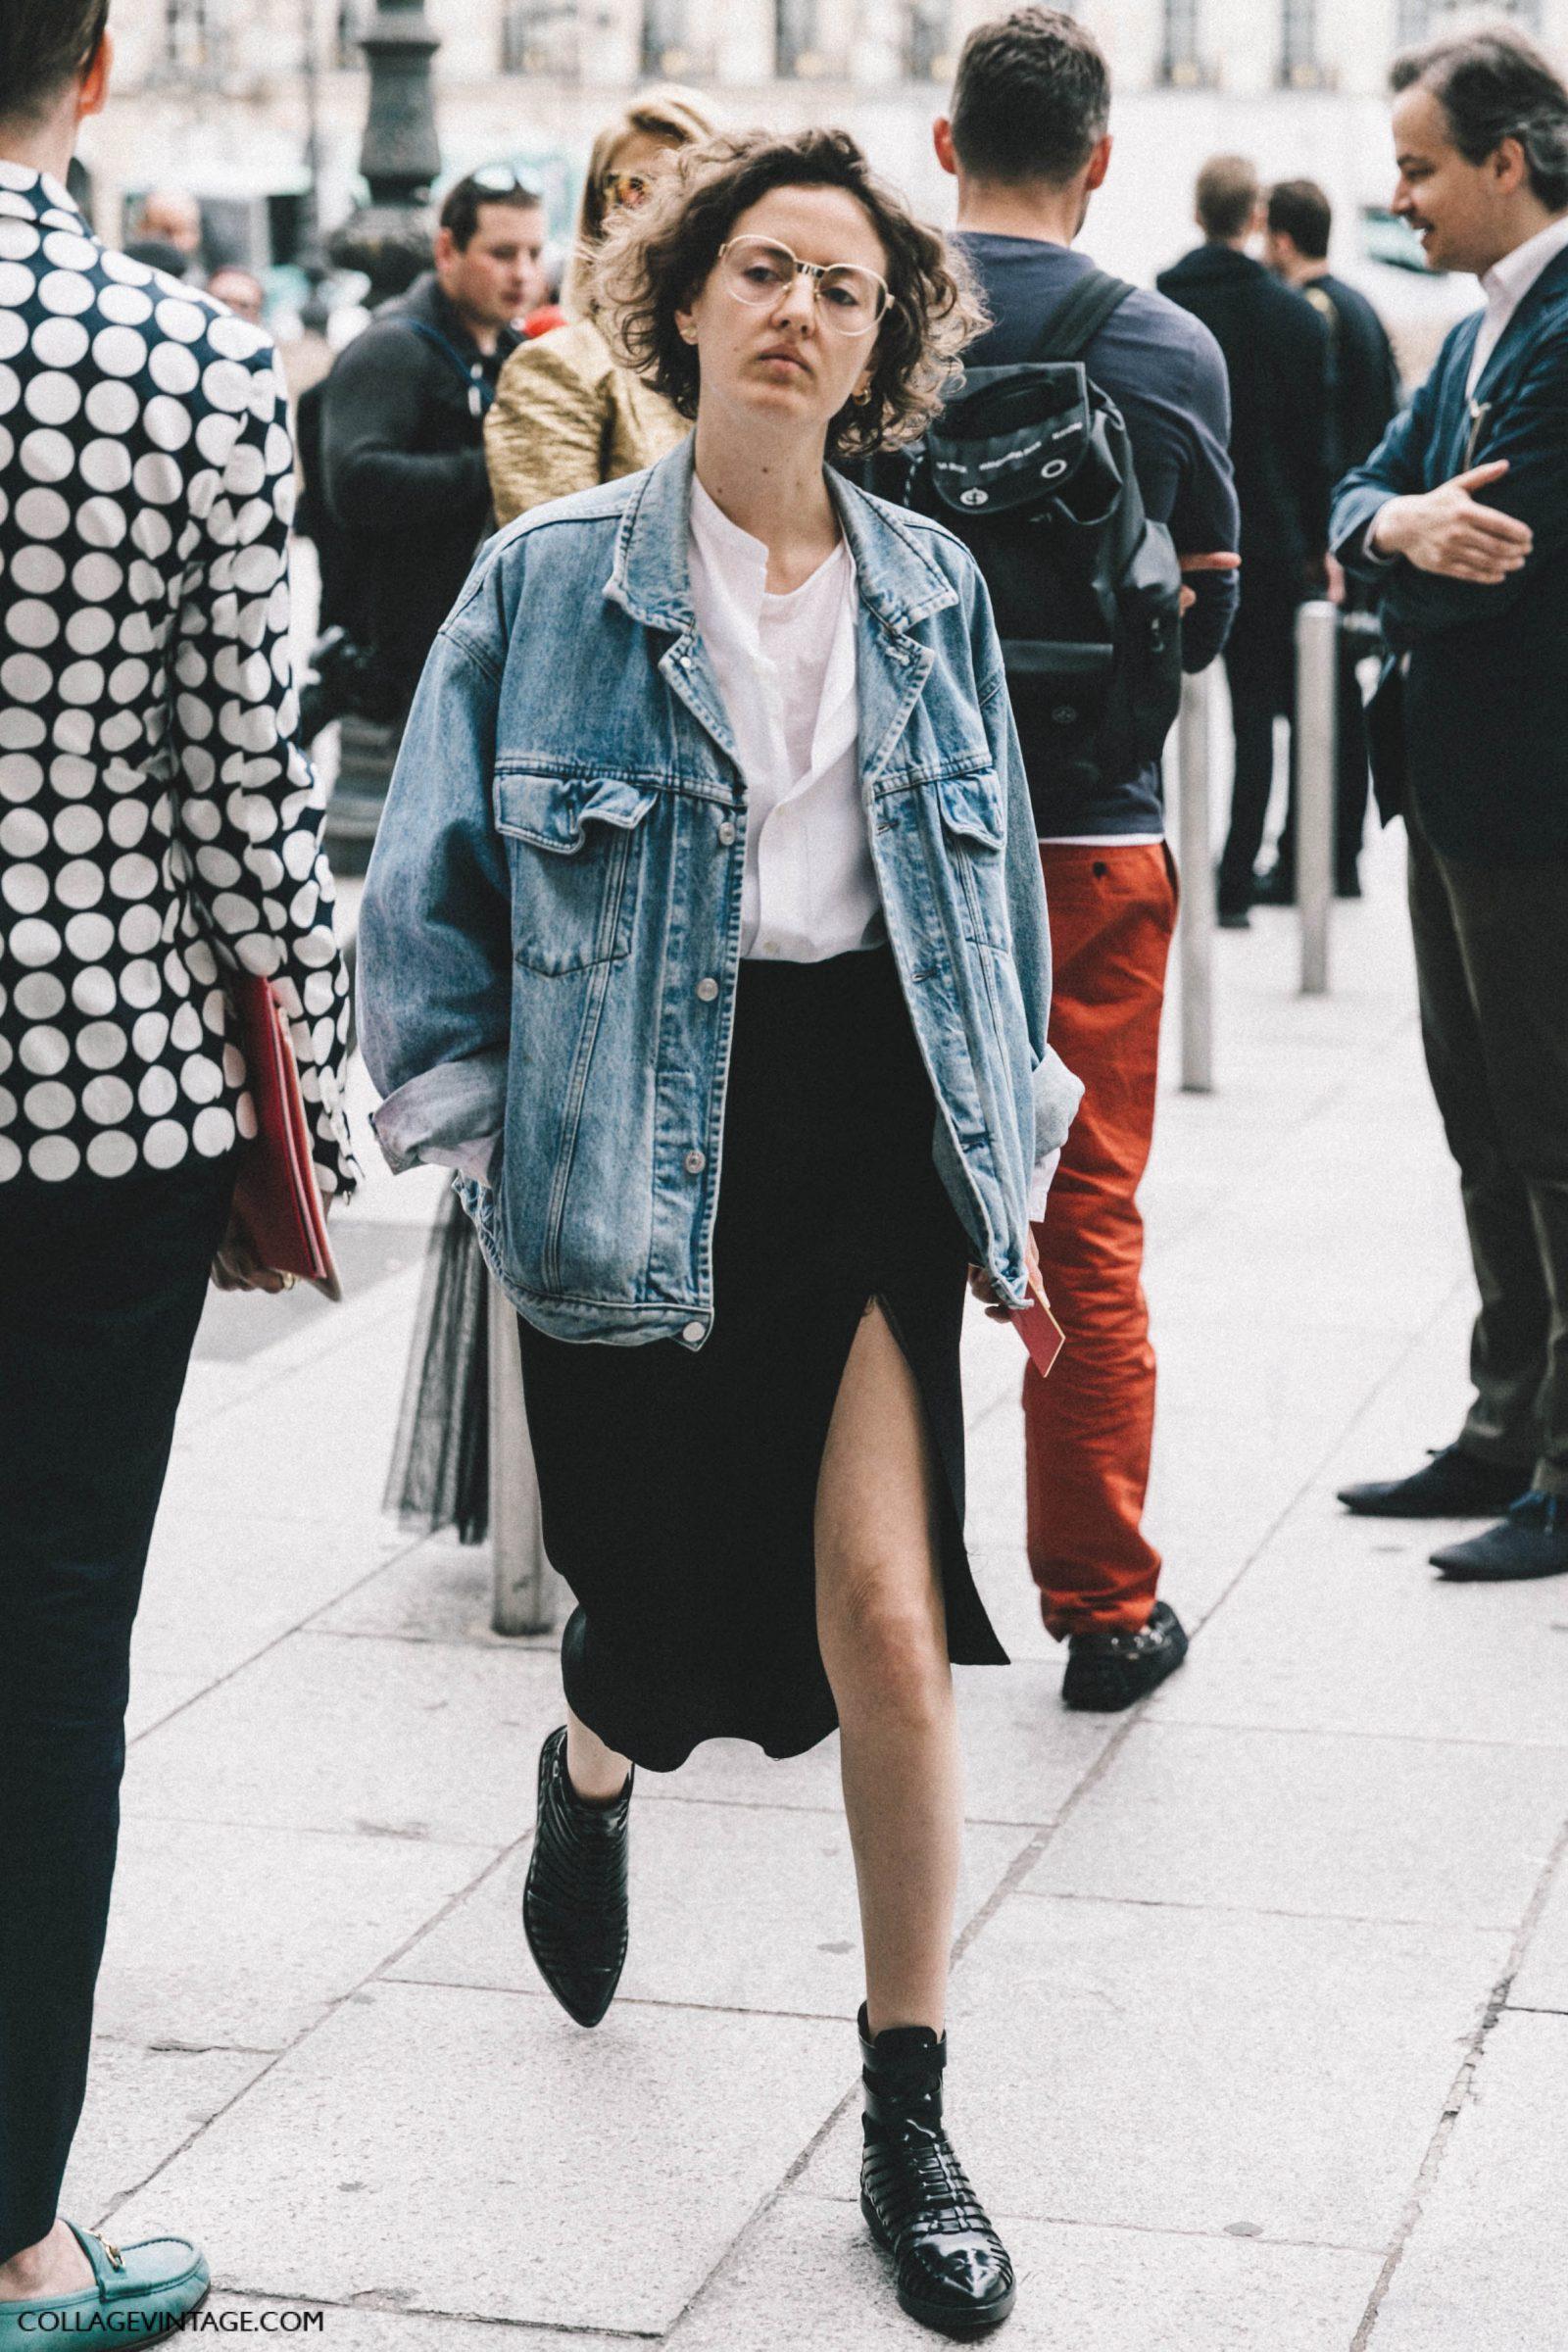 Paris_Couture_Fashion_Week-Collage_Vintage-Street_Style-28